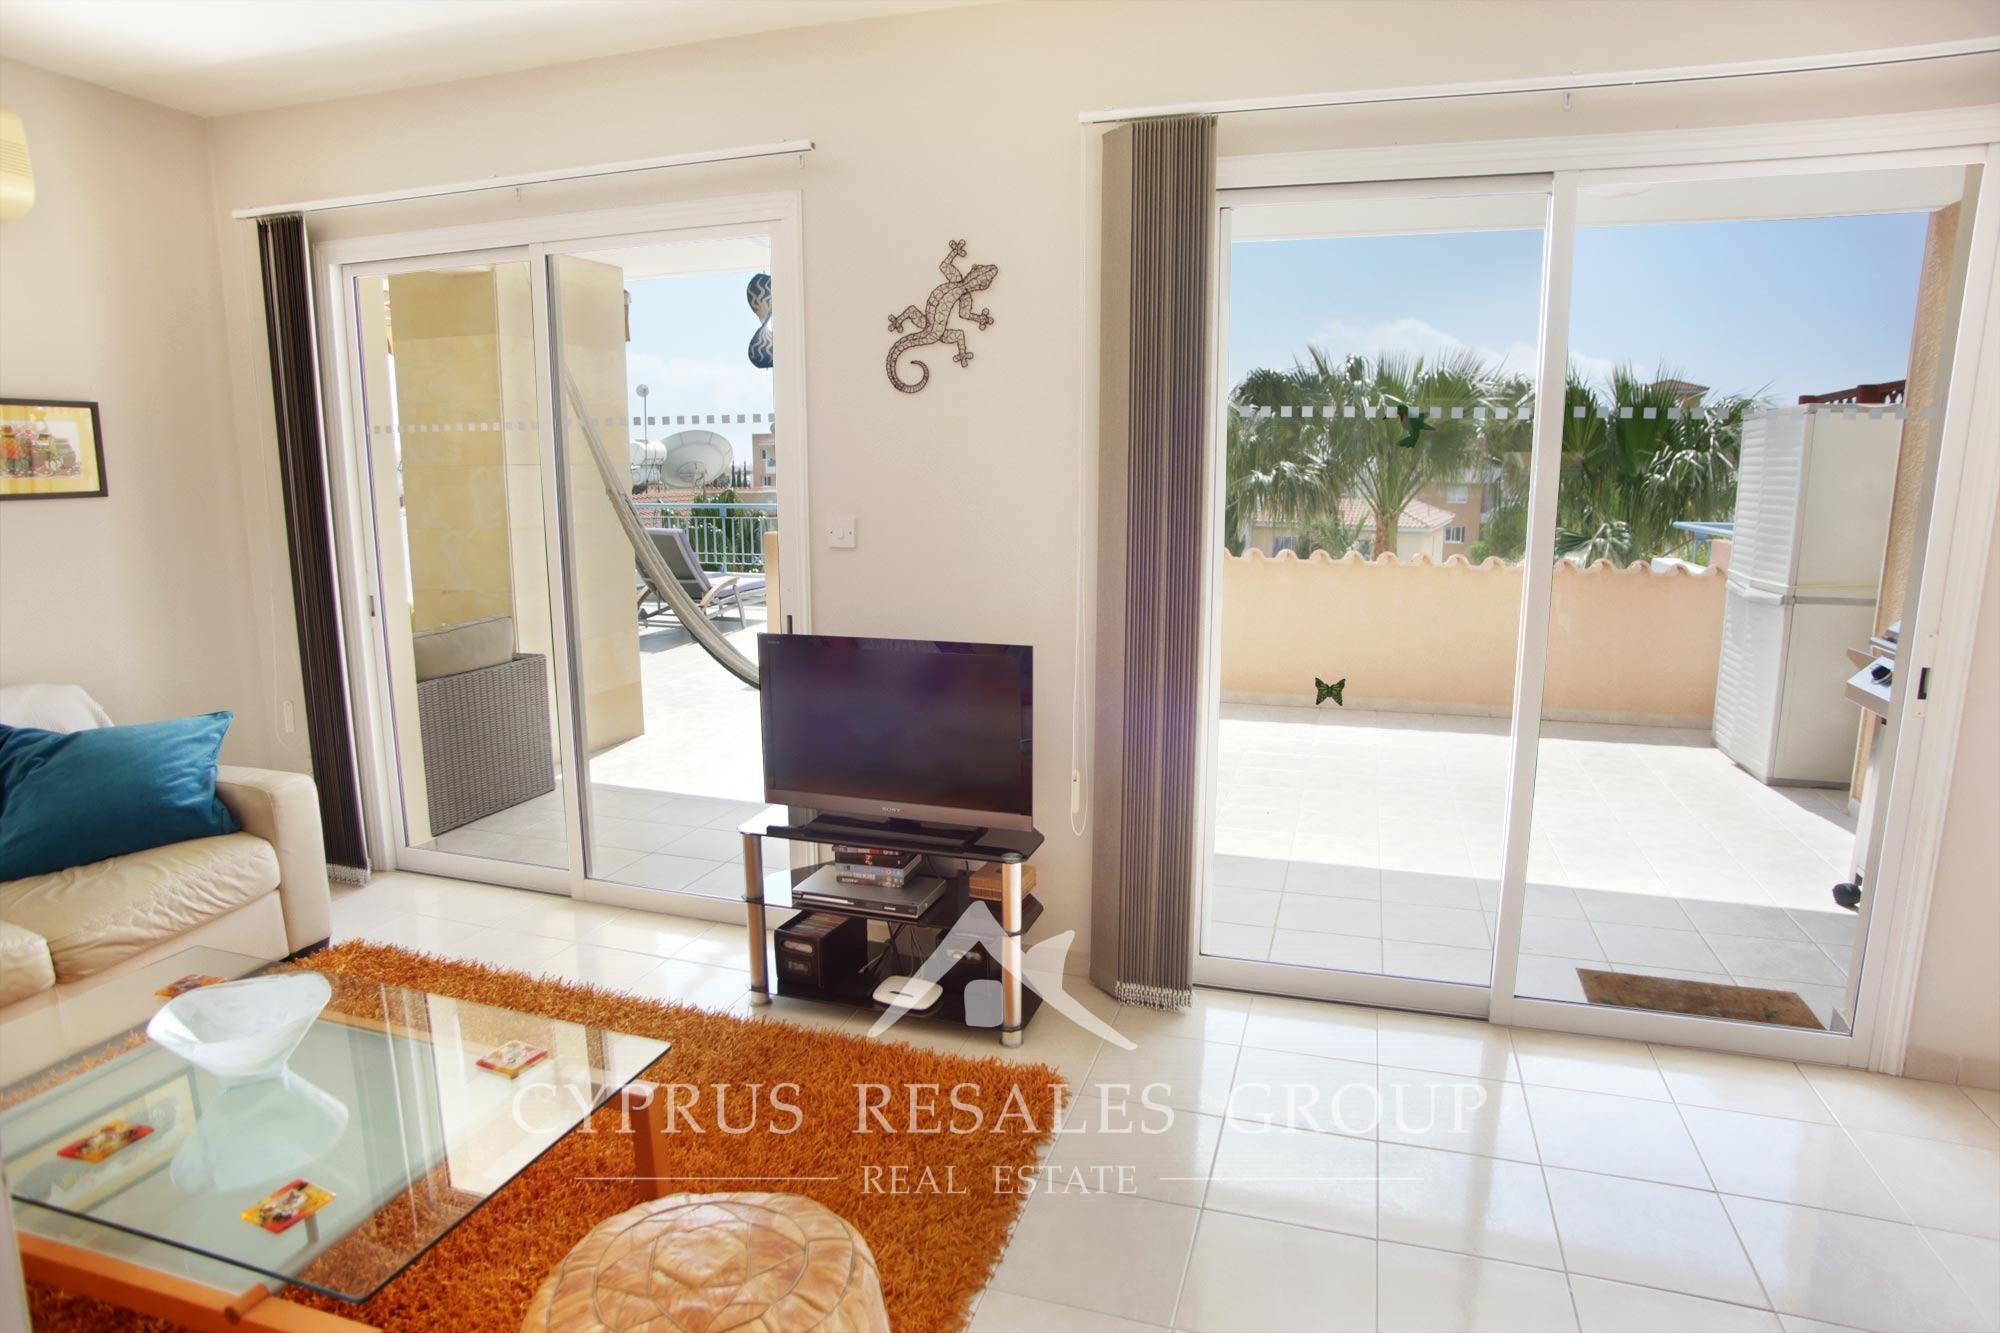 3 Bedroom Penthouse Apartment in Ilios II Kato Paphos Cyprus